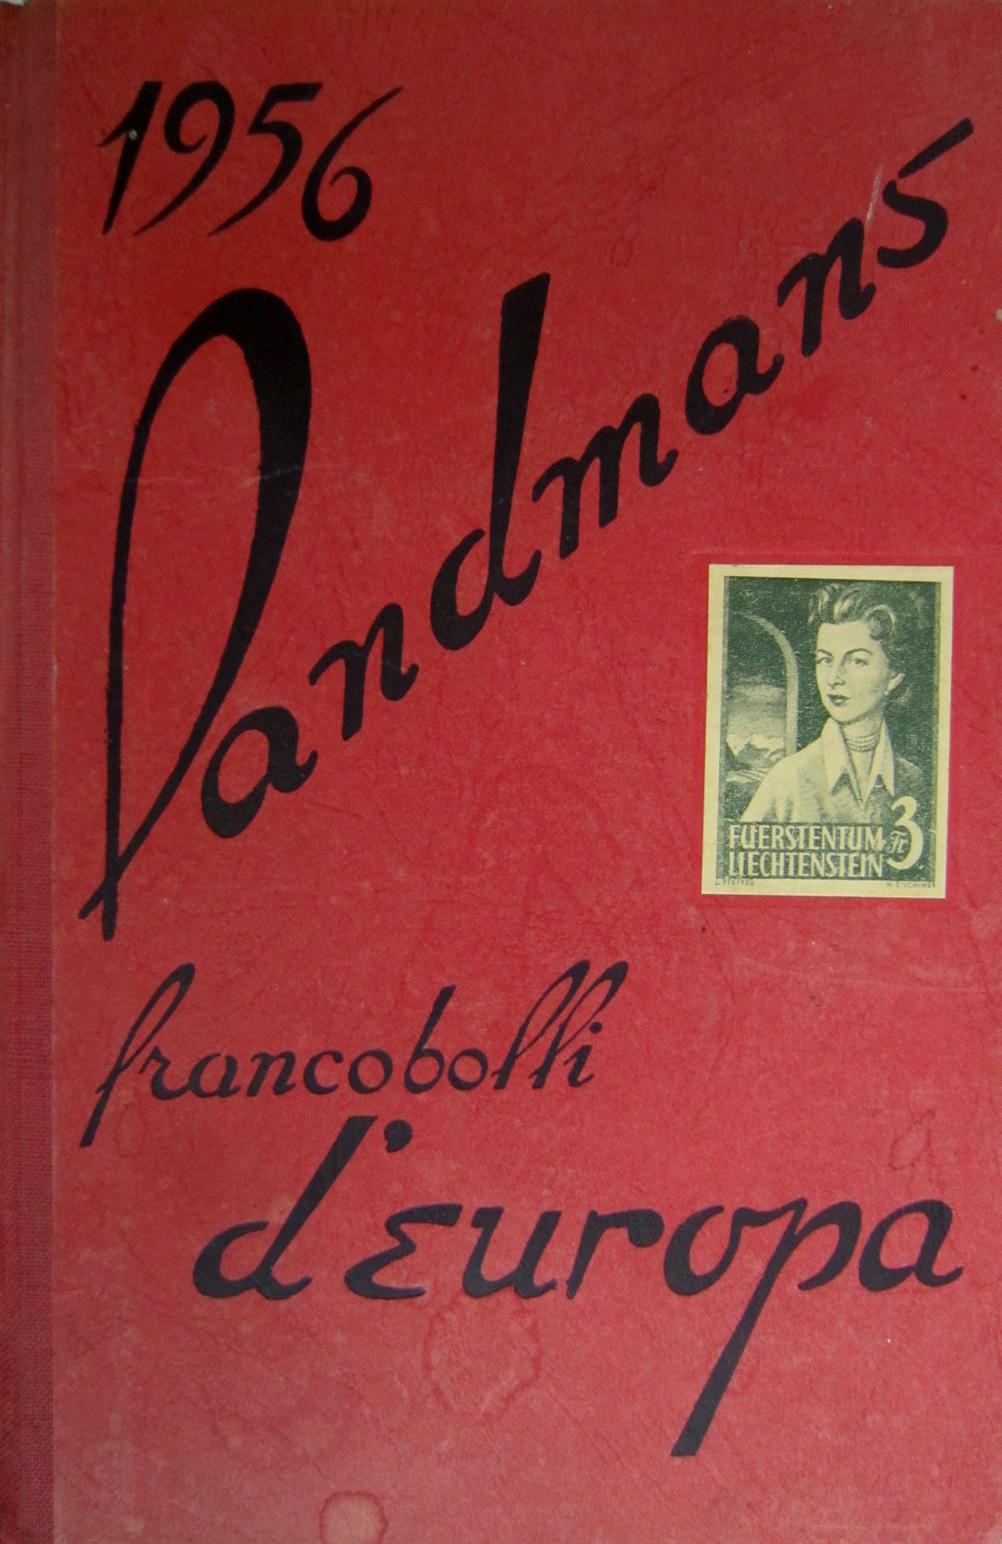 Catalogo Landmans dei francobolli d'Europa 1956